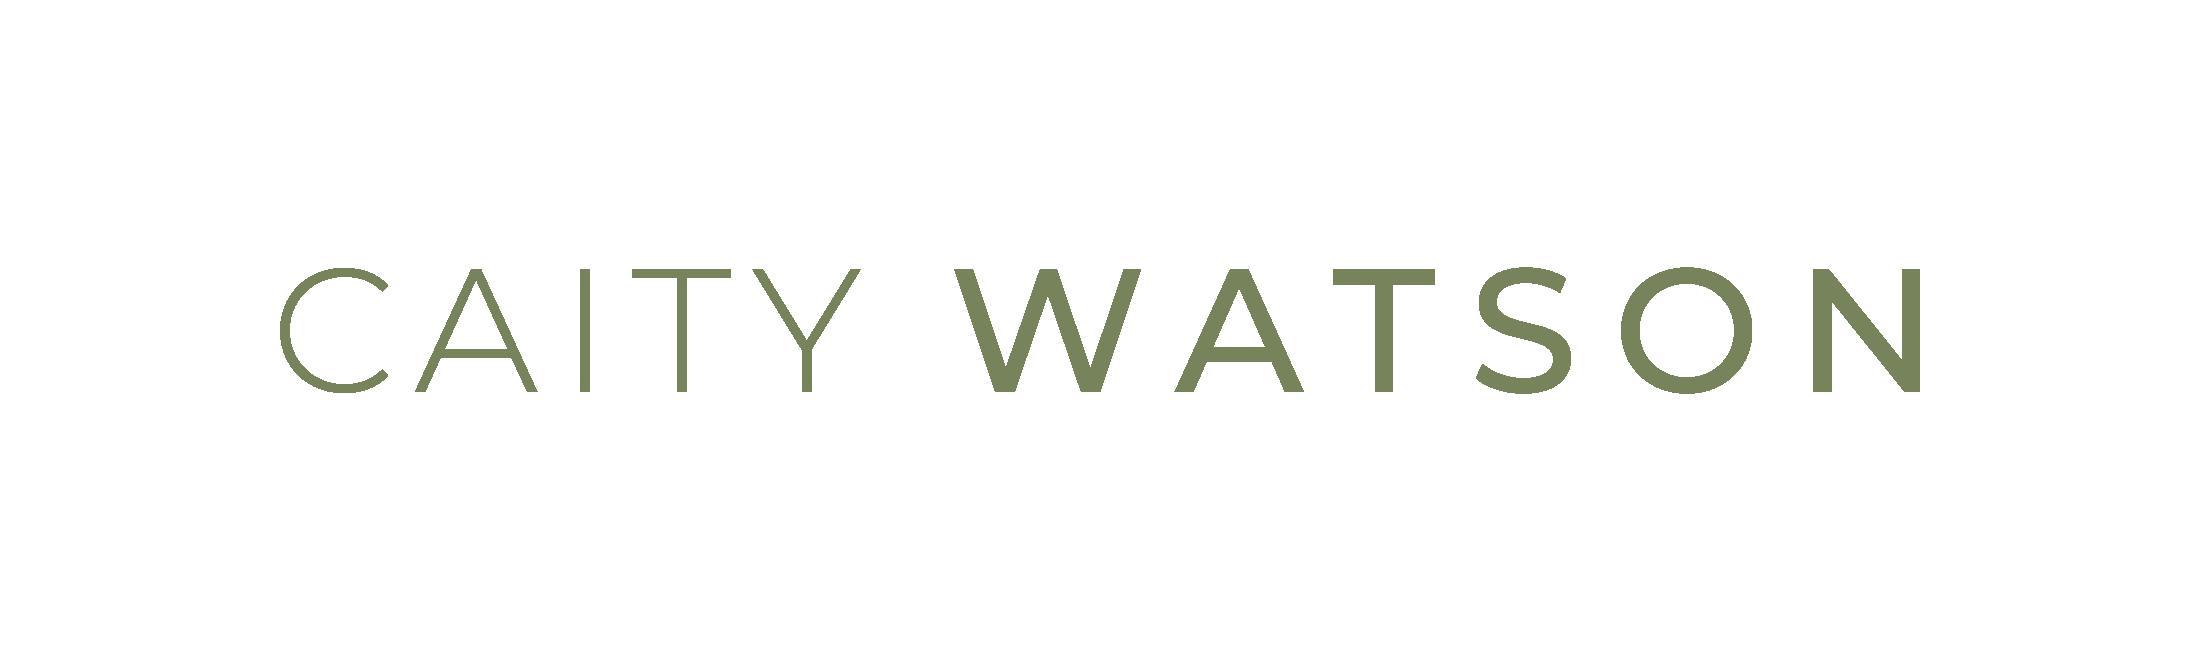 CAITY WATSON